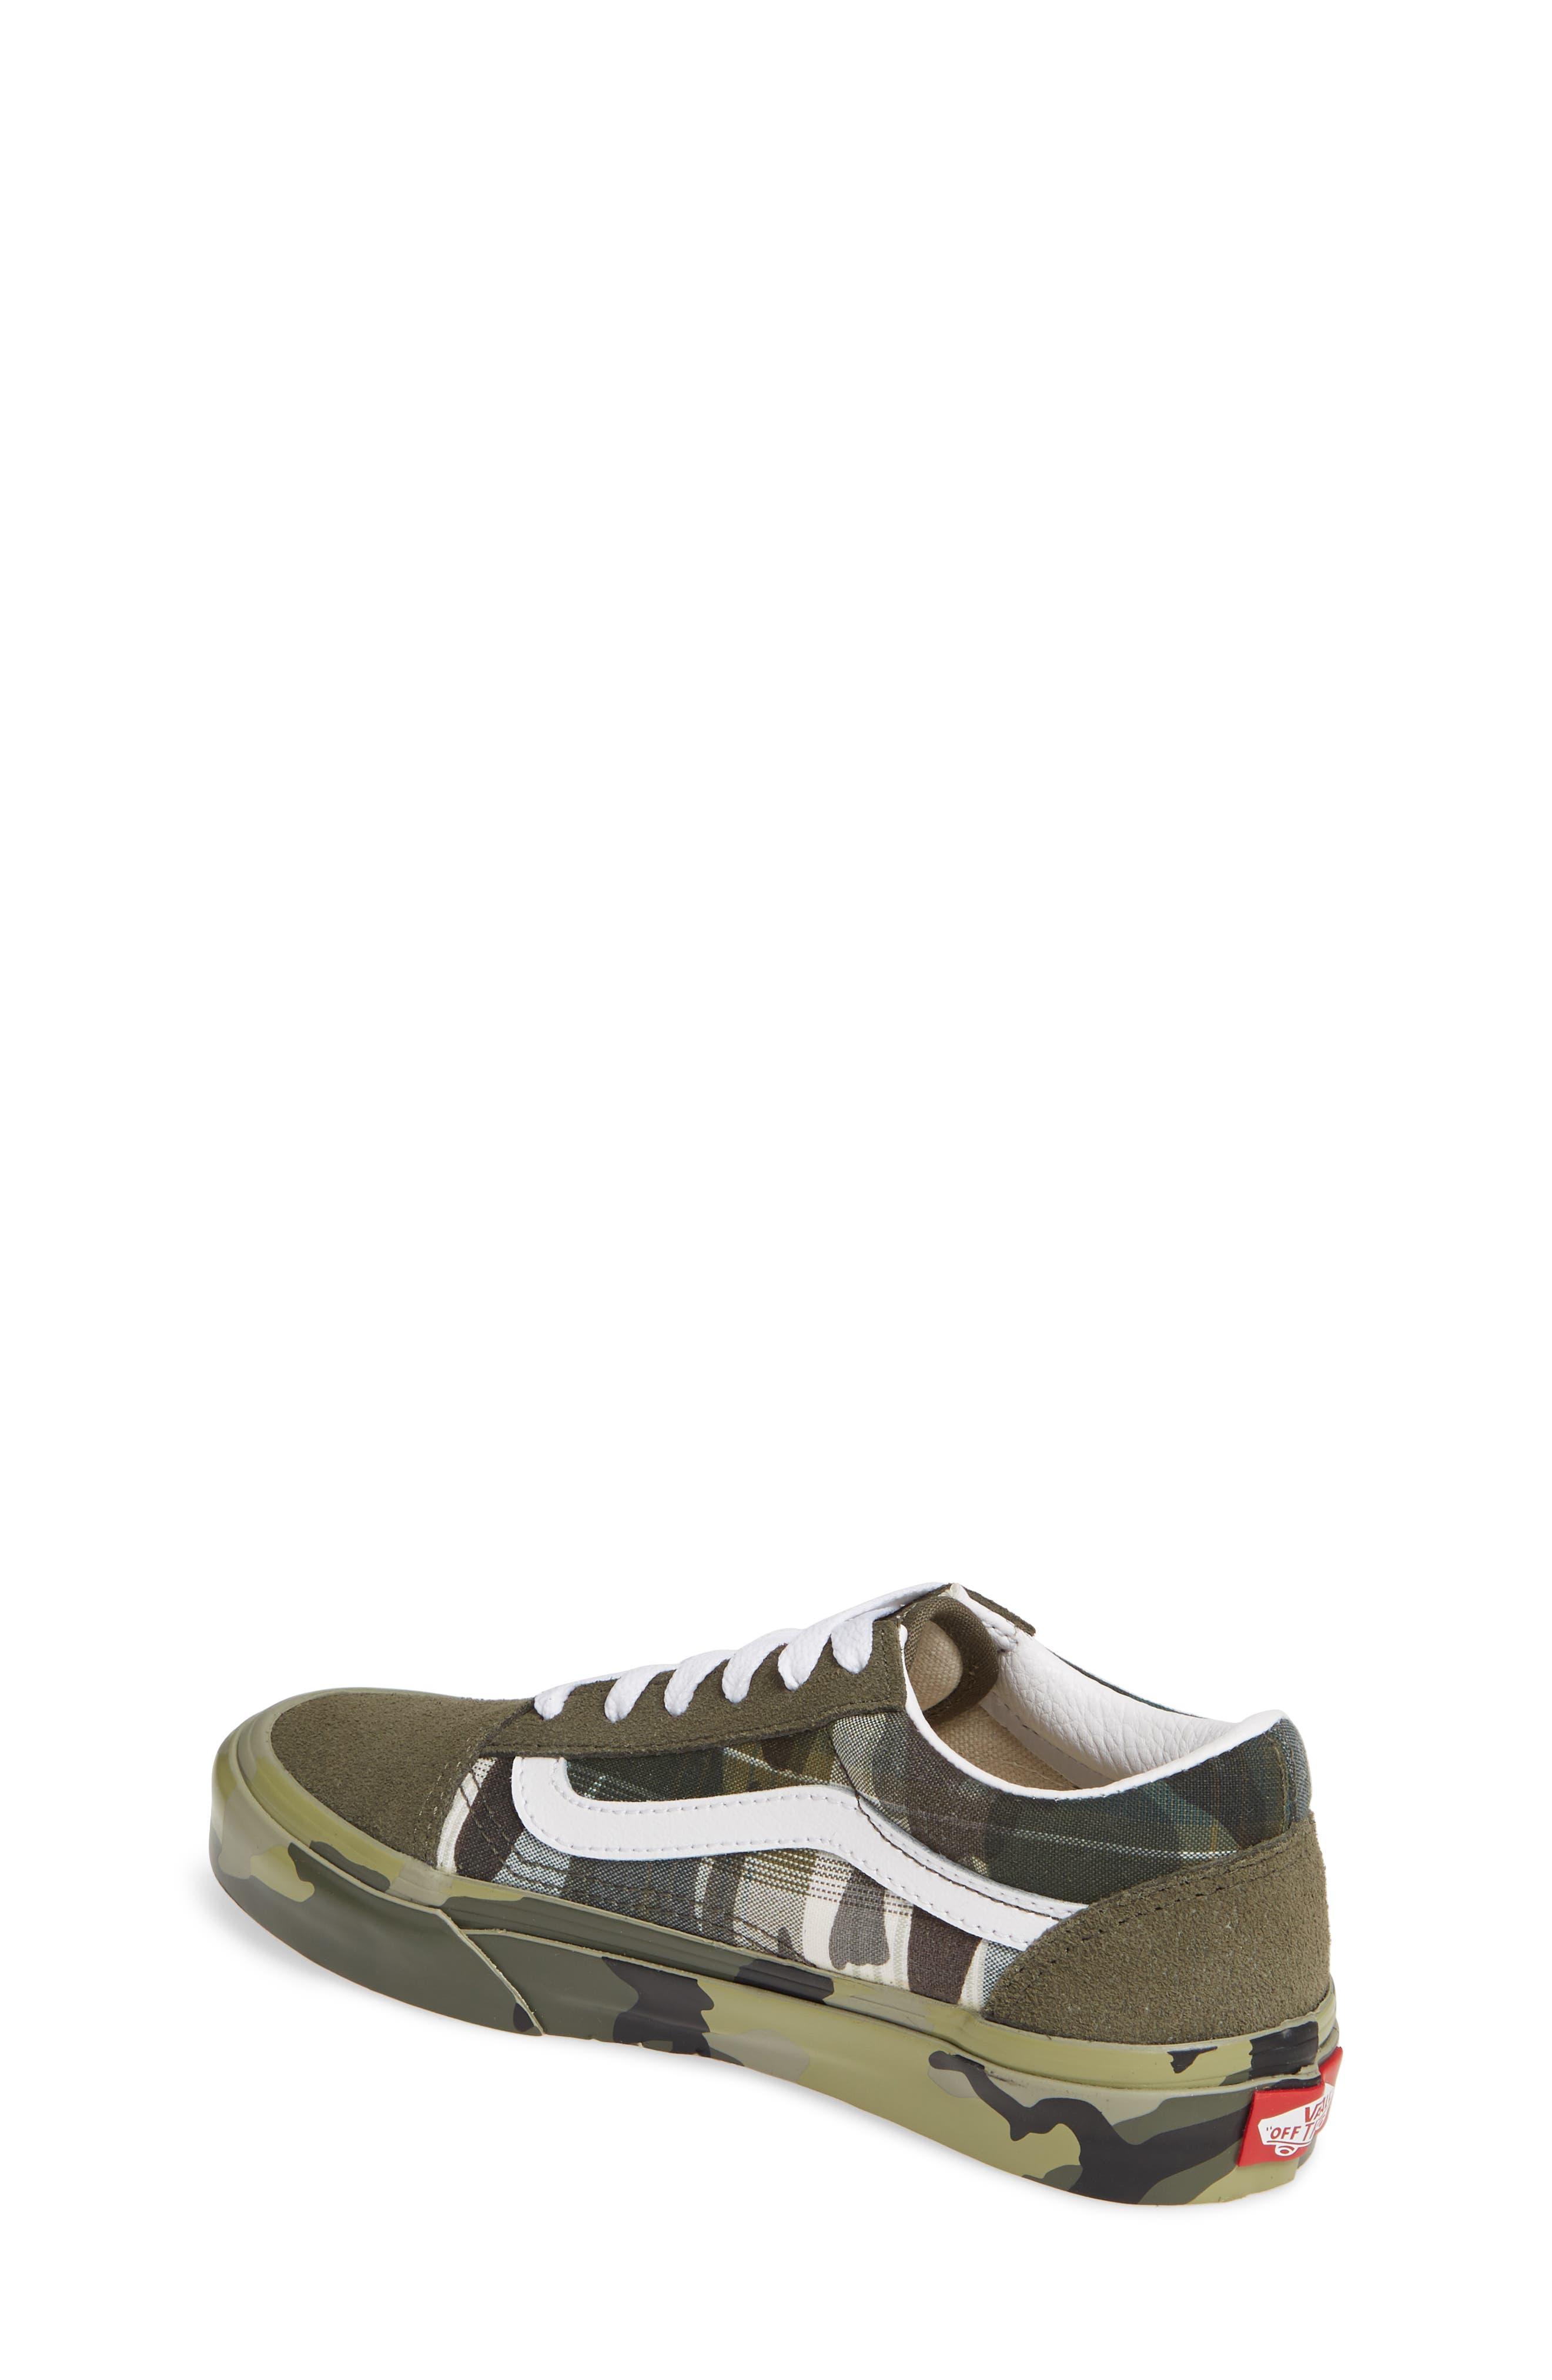 VANS, Old Skool Sneaker, Alternate thumbnail 2, color, PLAID CAMO GRAPE LEAF/ WHITE